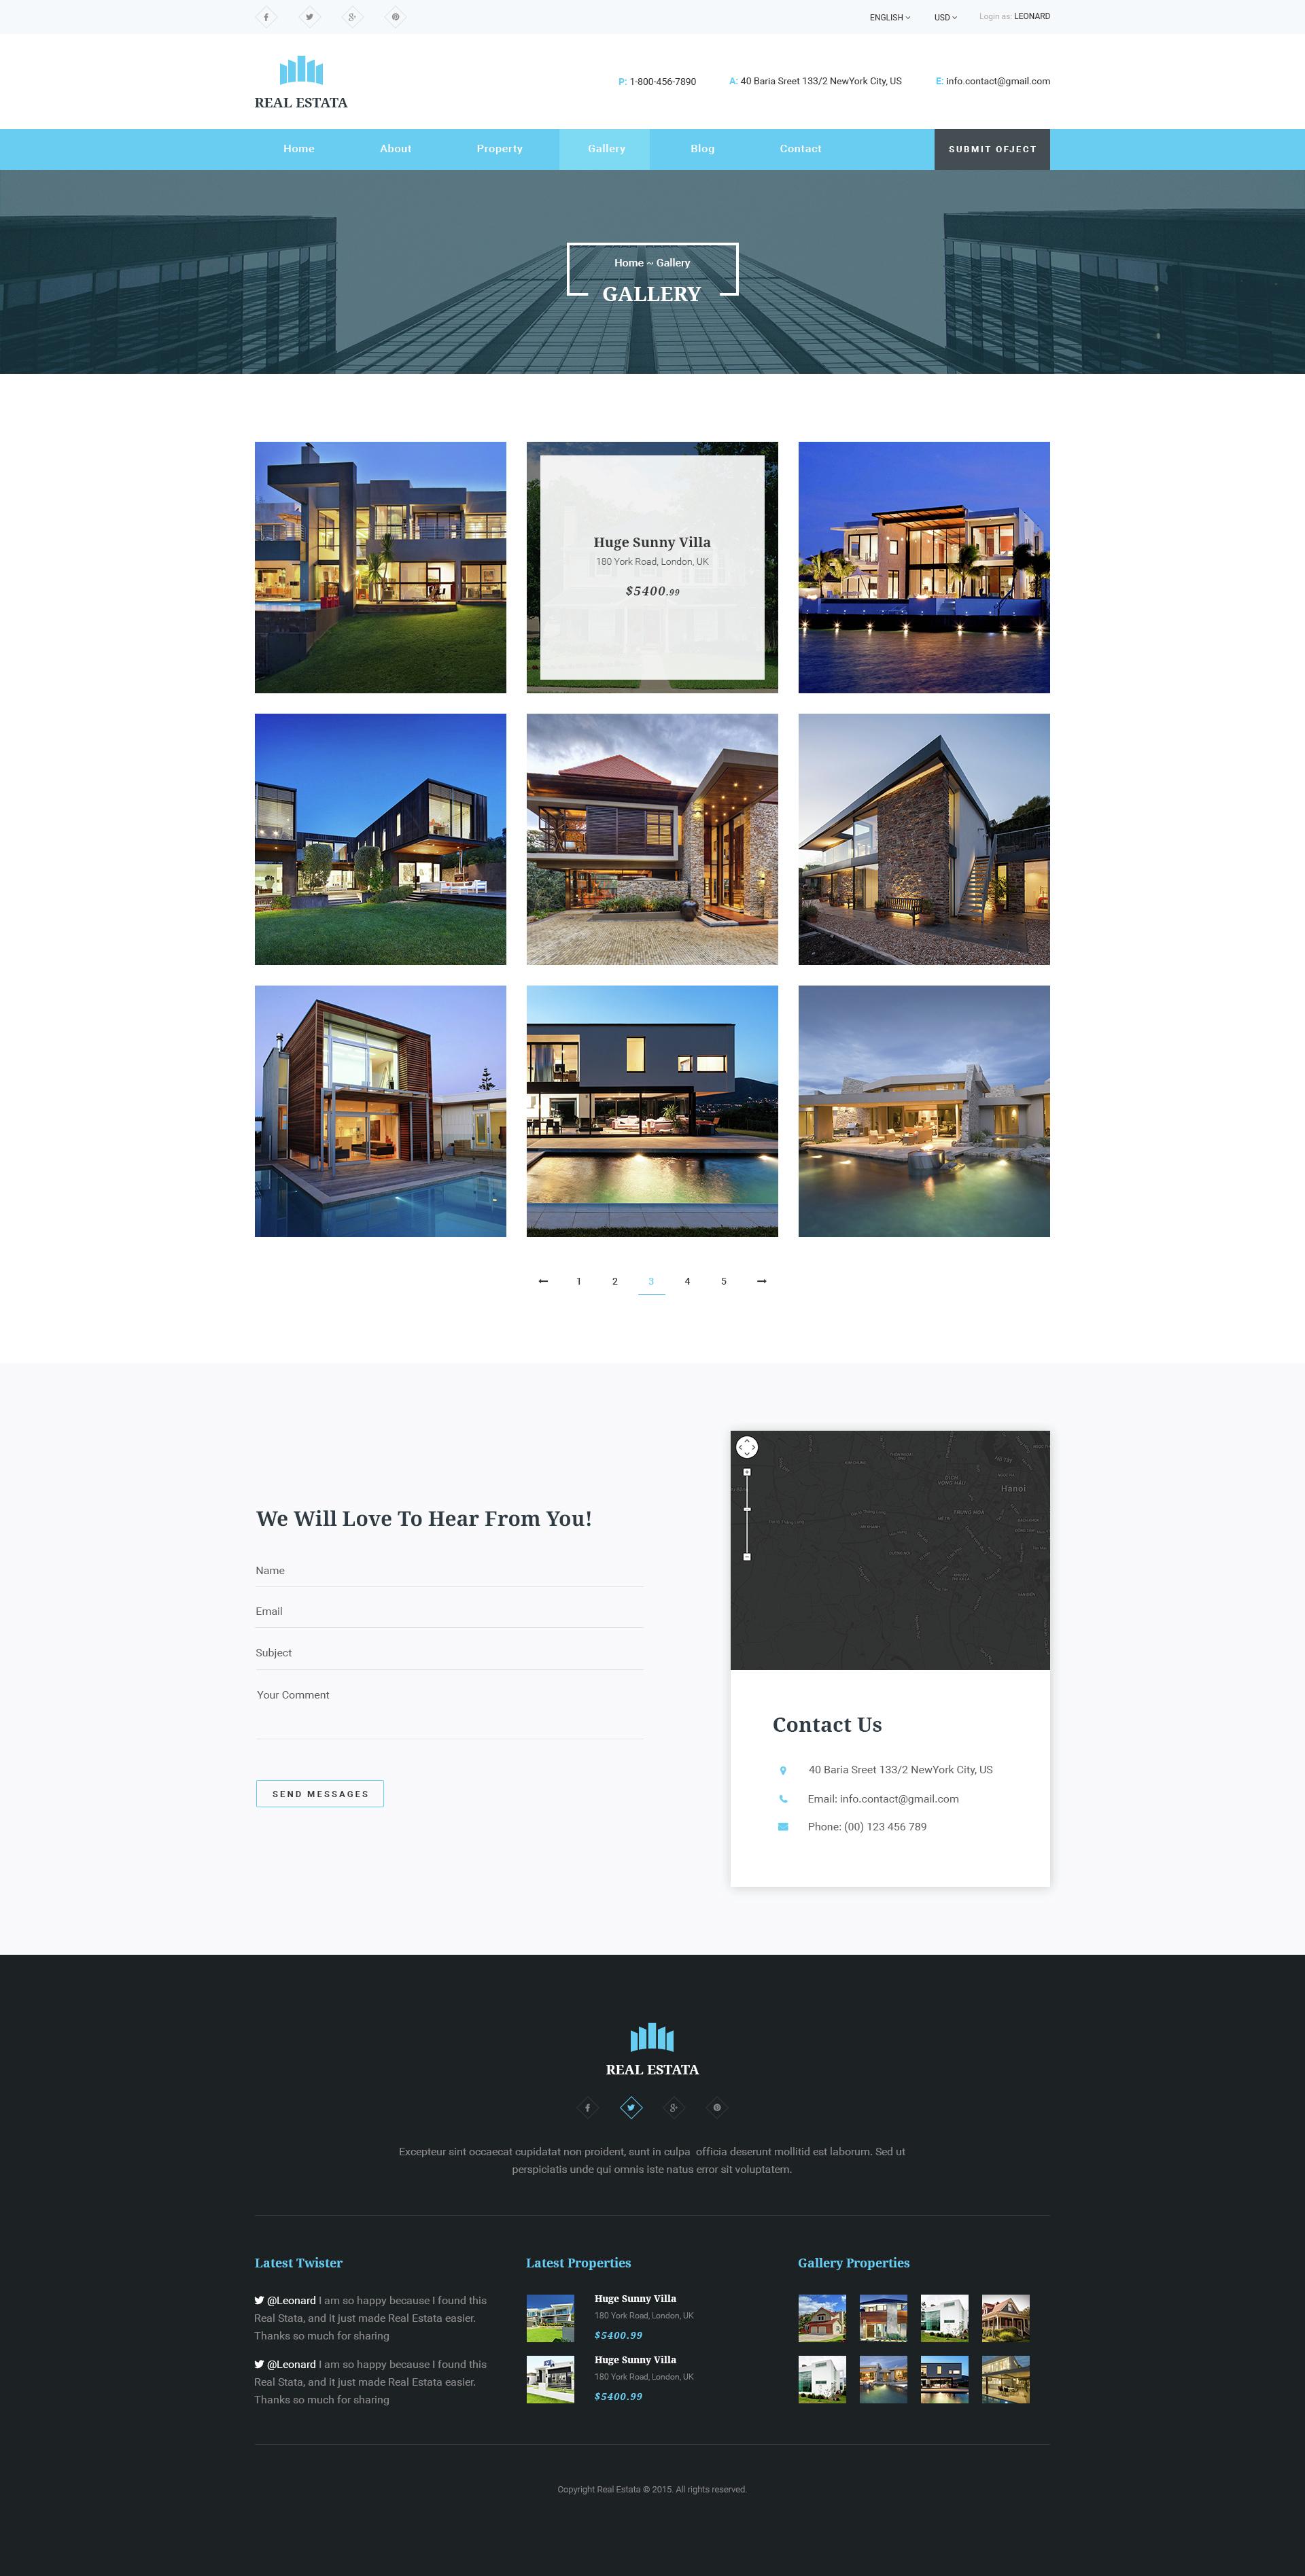 Gmail themes city - Real Estata Real Estate Psd Theme